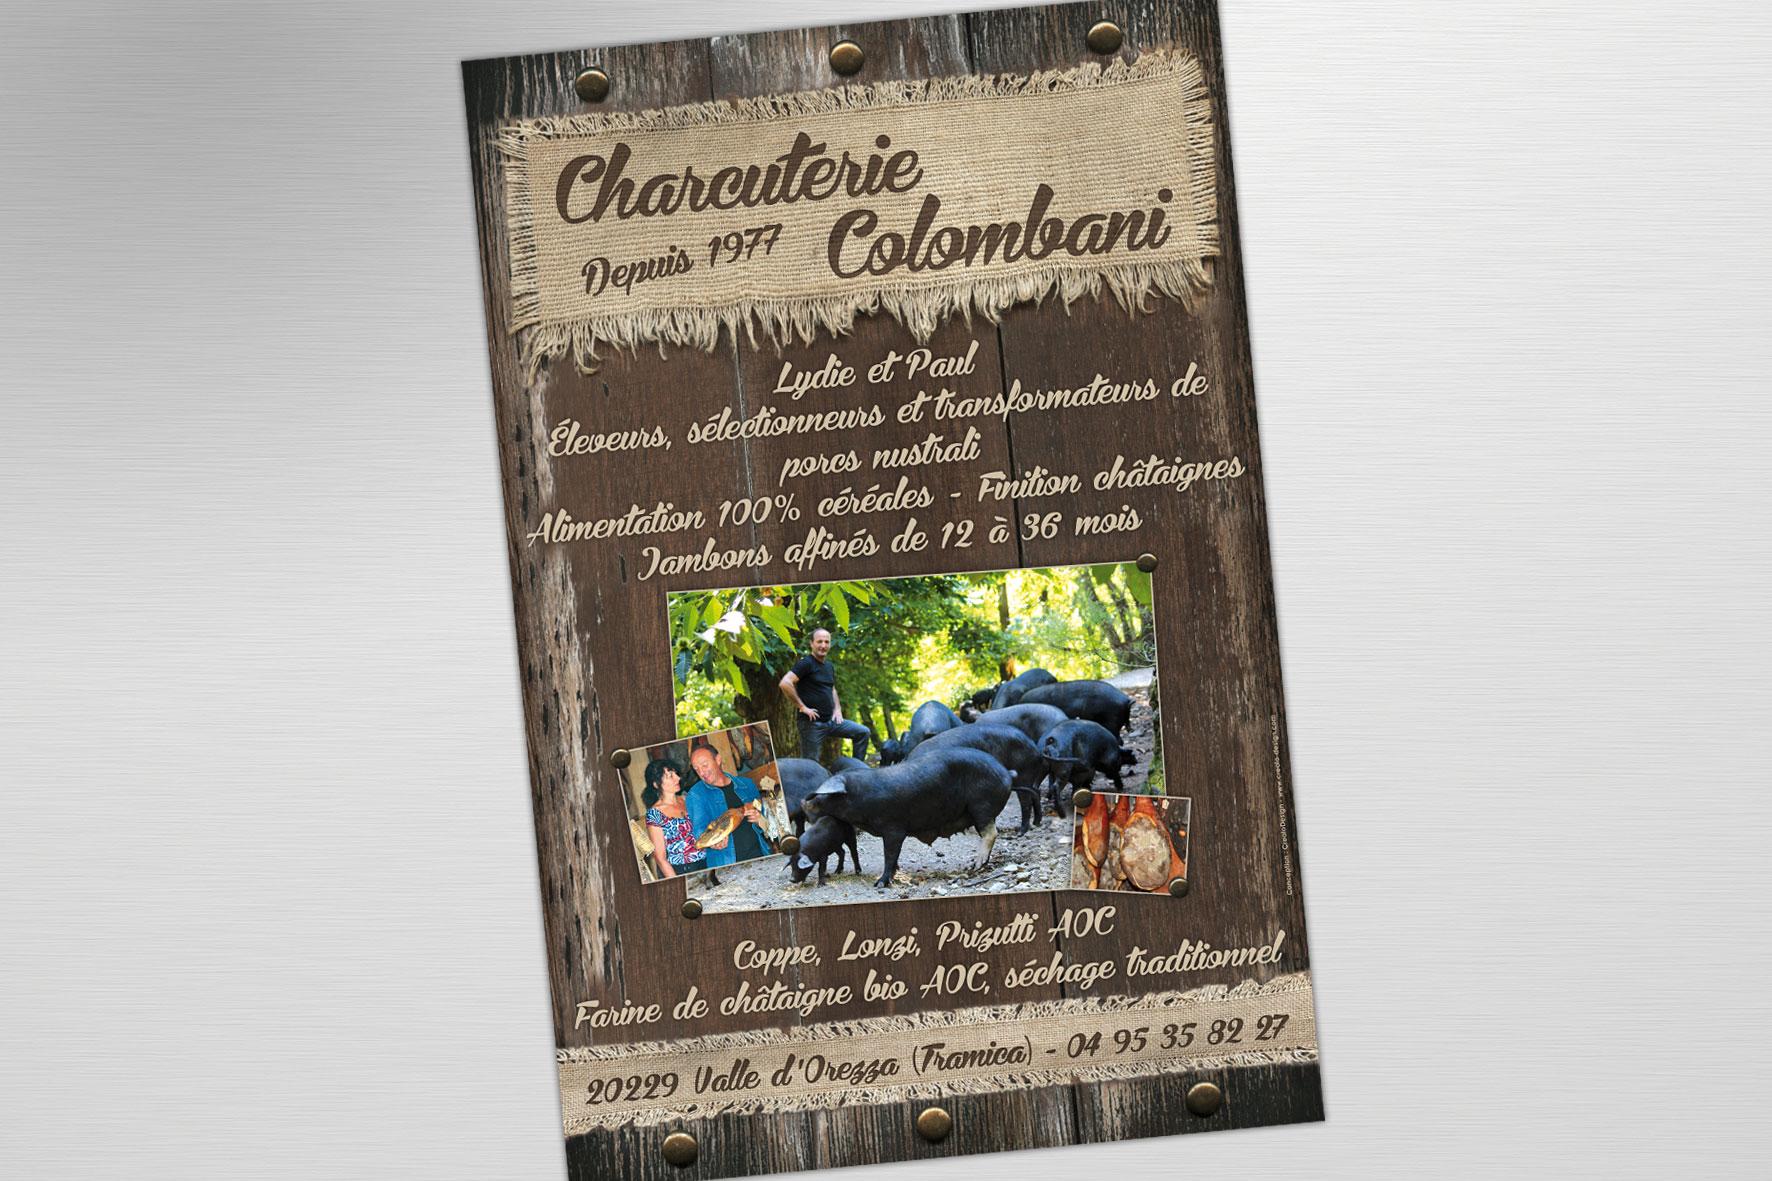 Colombani Charcuterie